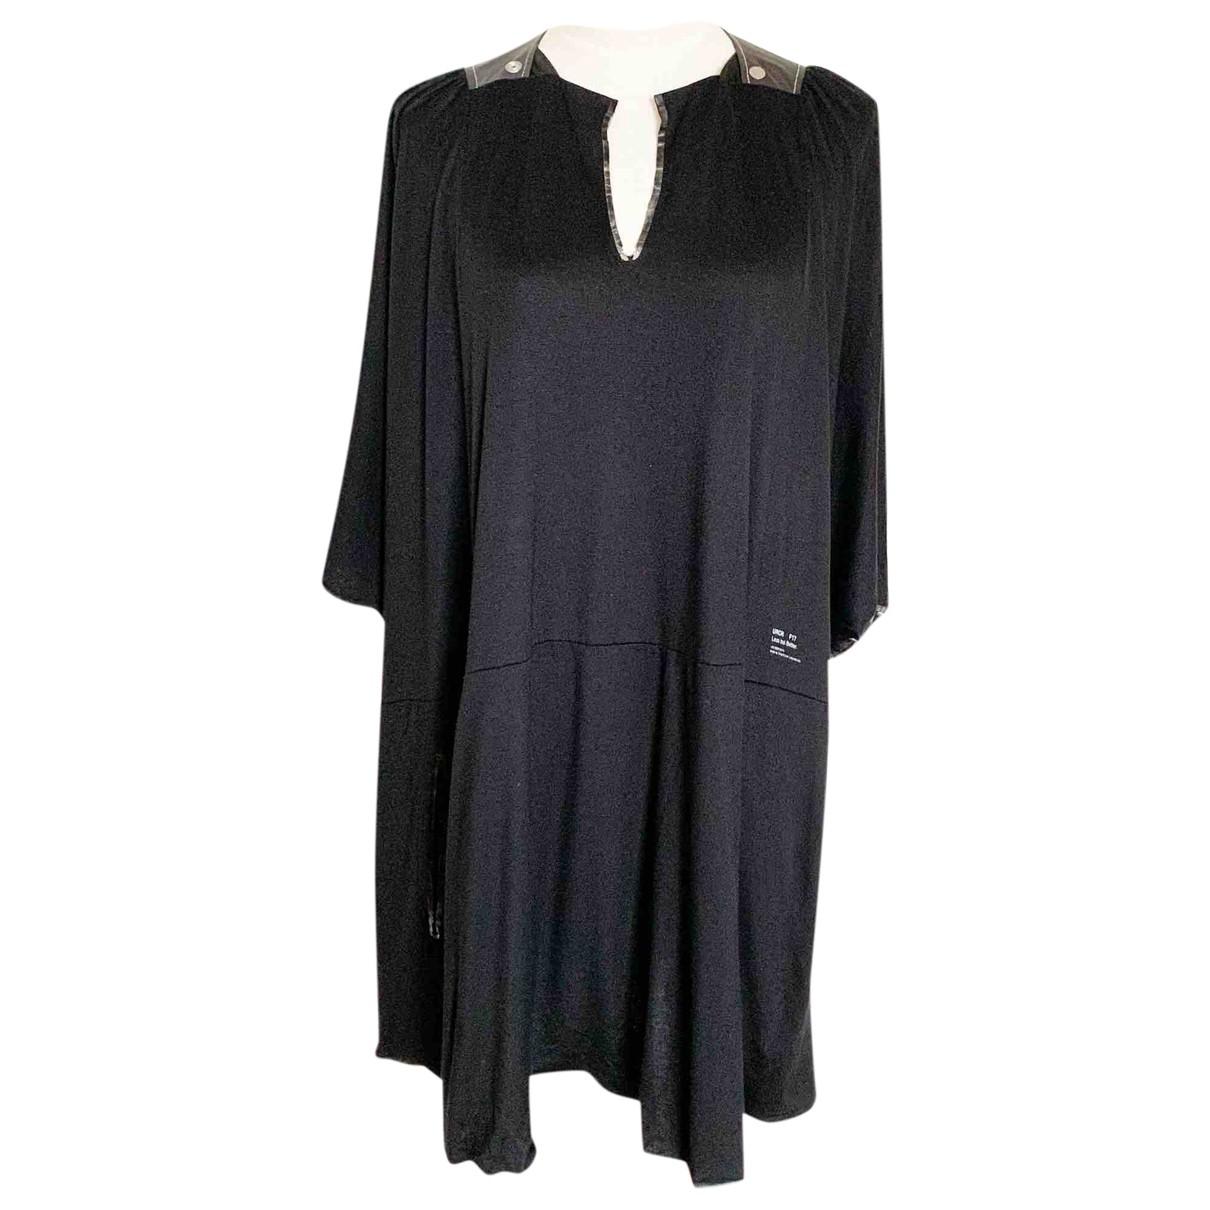 Undercover \N Black Cotton dress for Women 1 0-5